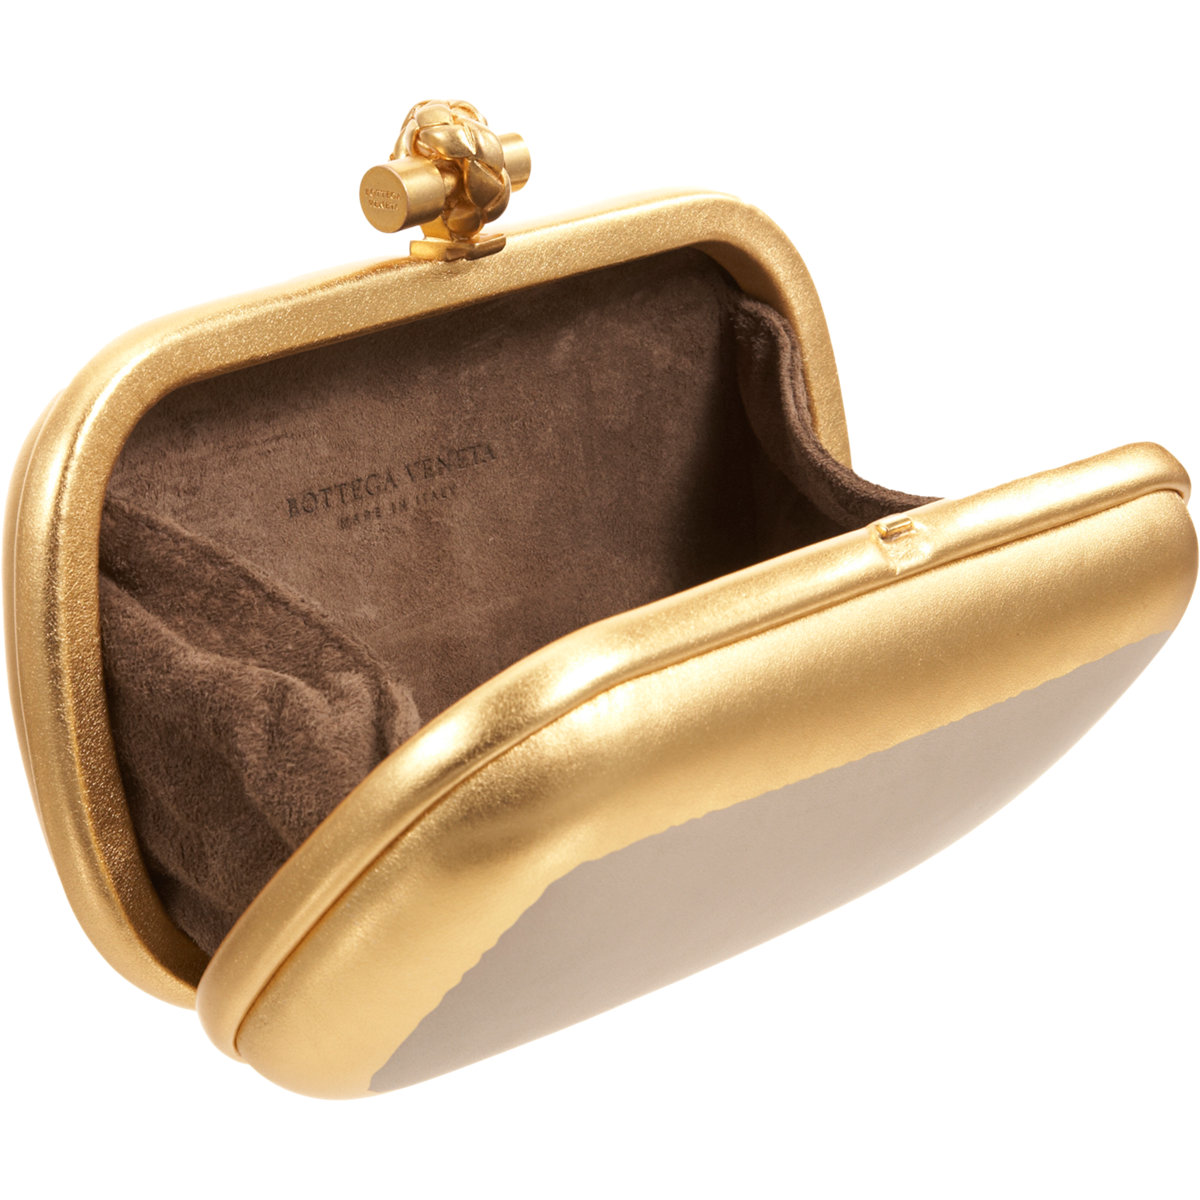 bottega veneta knot gilded waxed clutch in metallic lyst. Black Bedroom Furniture Sets. Home Design Ideas